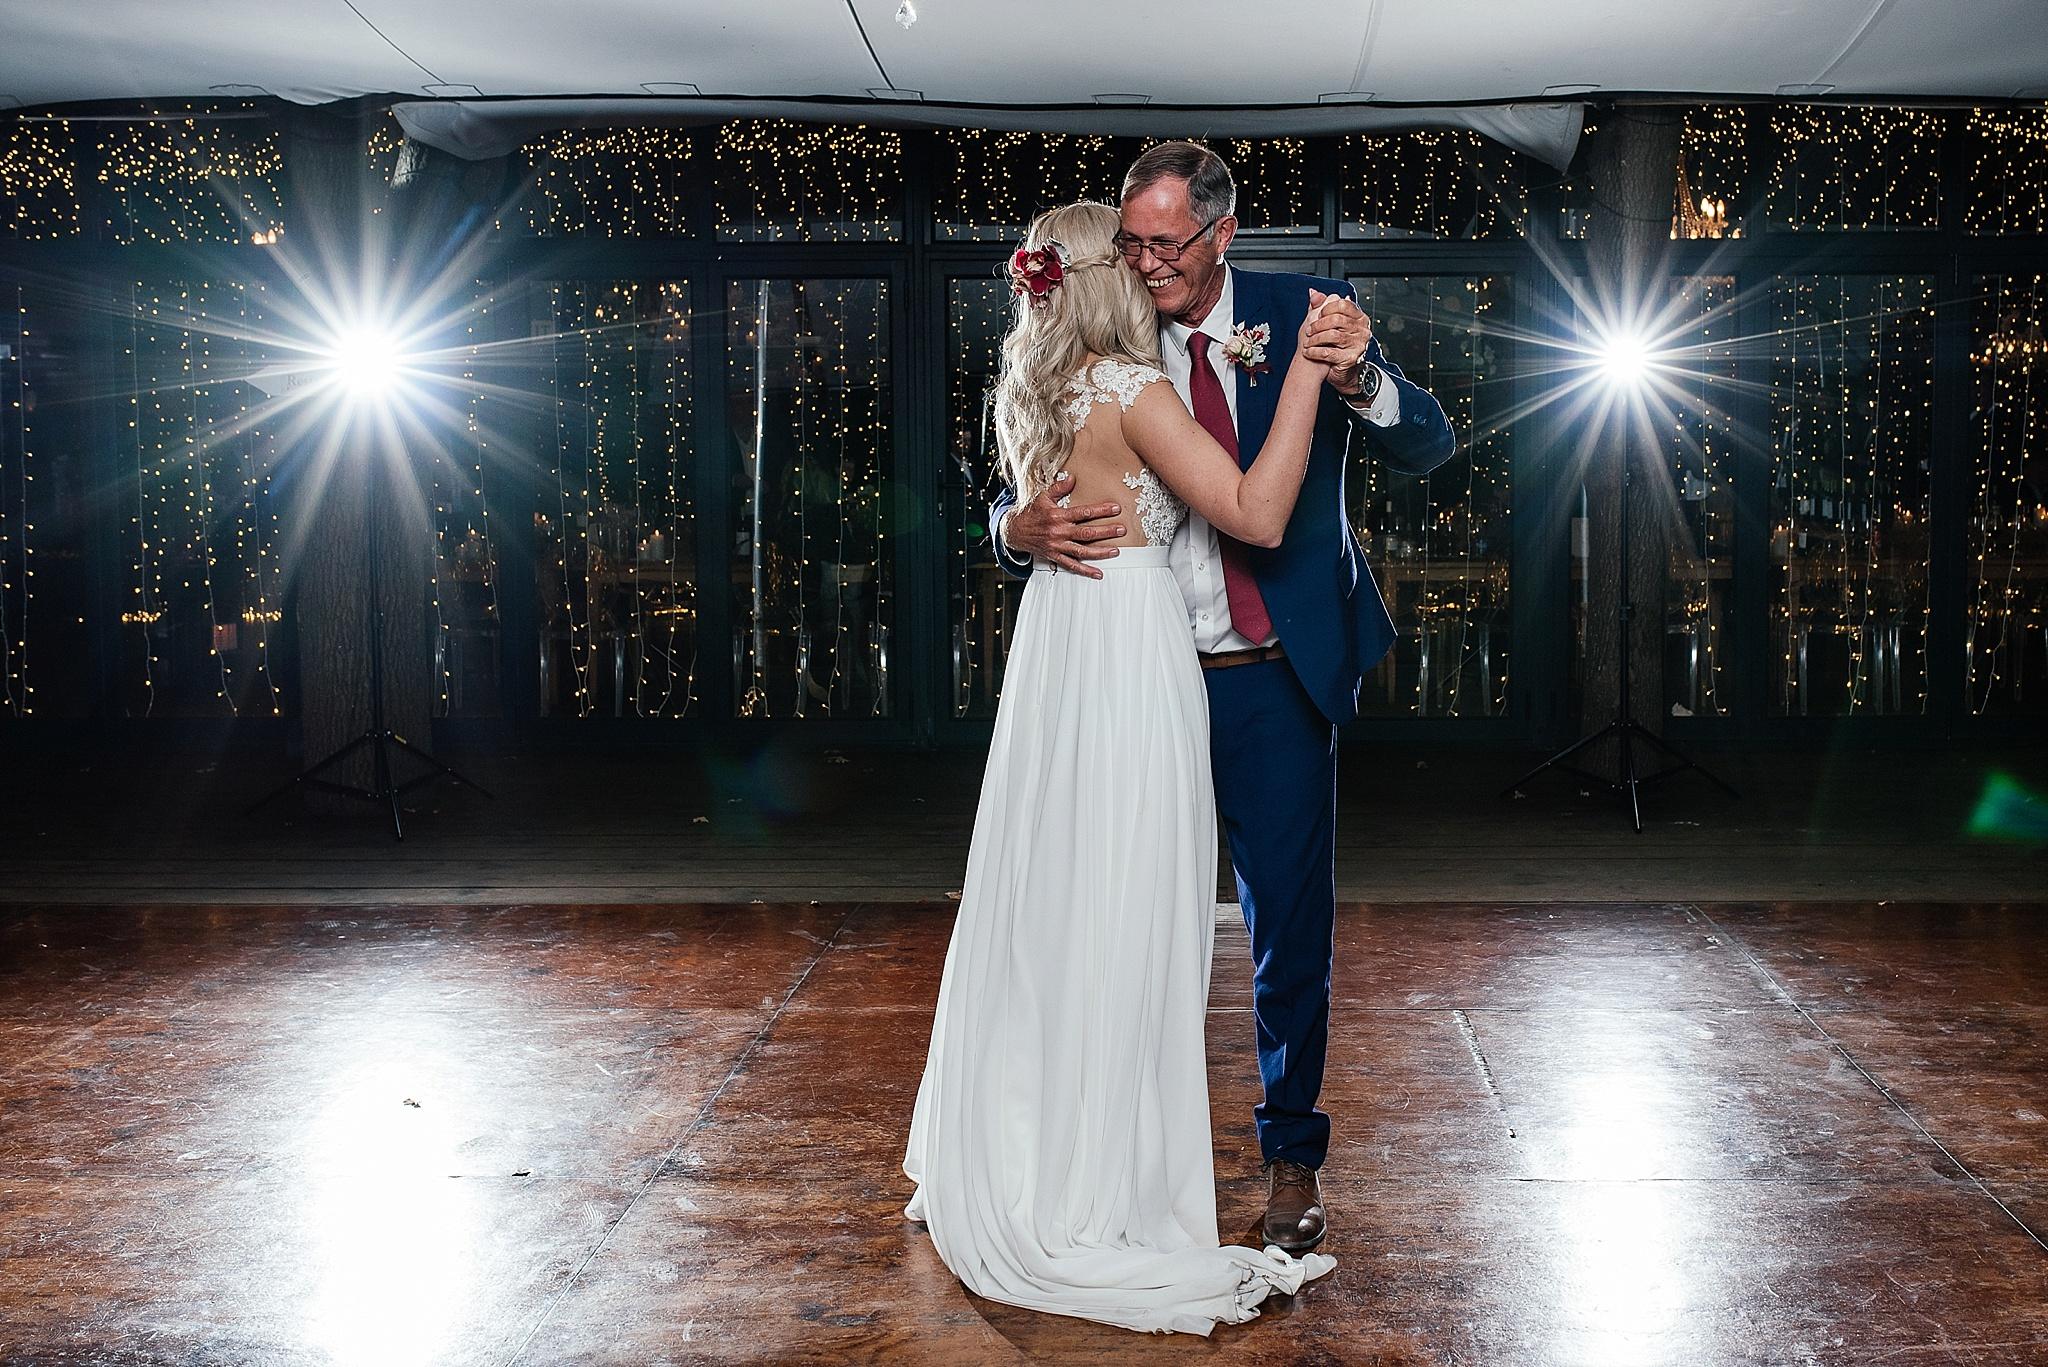 Cape Town Photographer Darren Bester - Die Woud Wedding - Gareth & Roxanne_0059.jpg